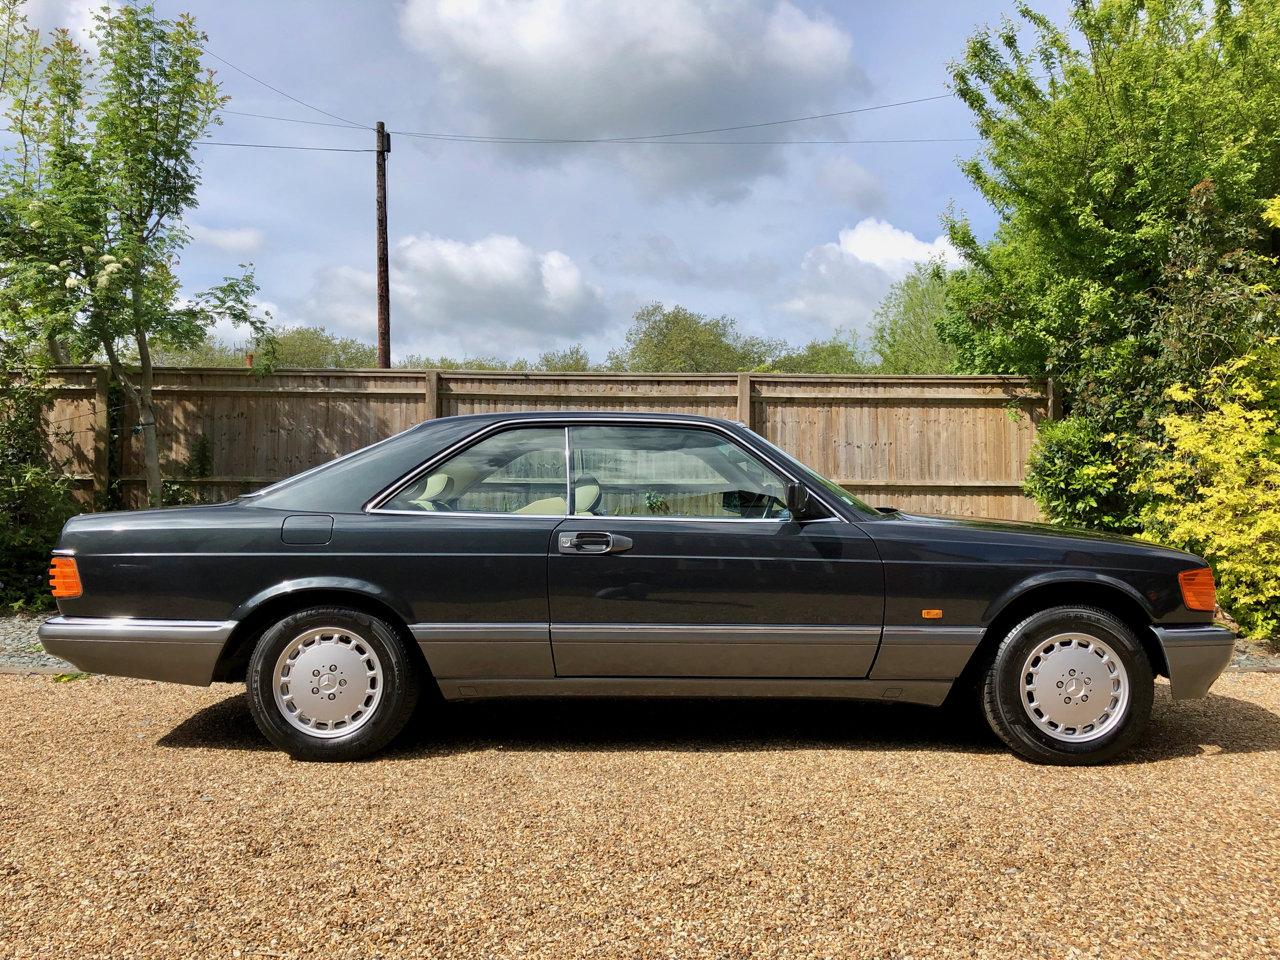 1992/J - Mercedes 420SEC C126 *SOLD* 560SEC 500 SEC For Sale (picture 2 of 6)